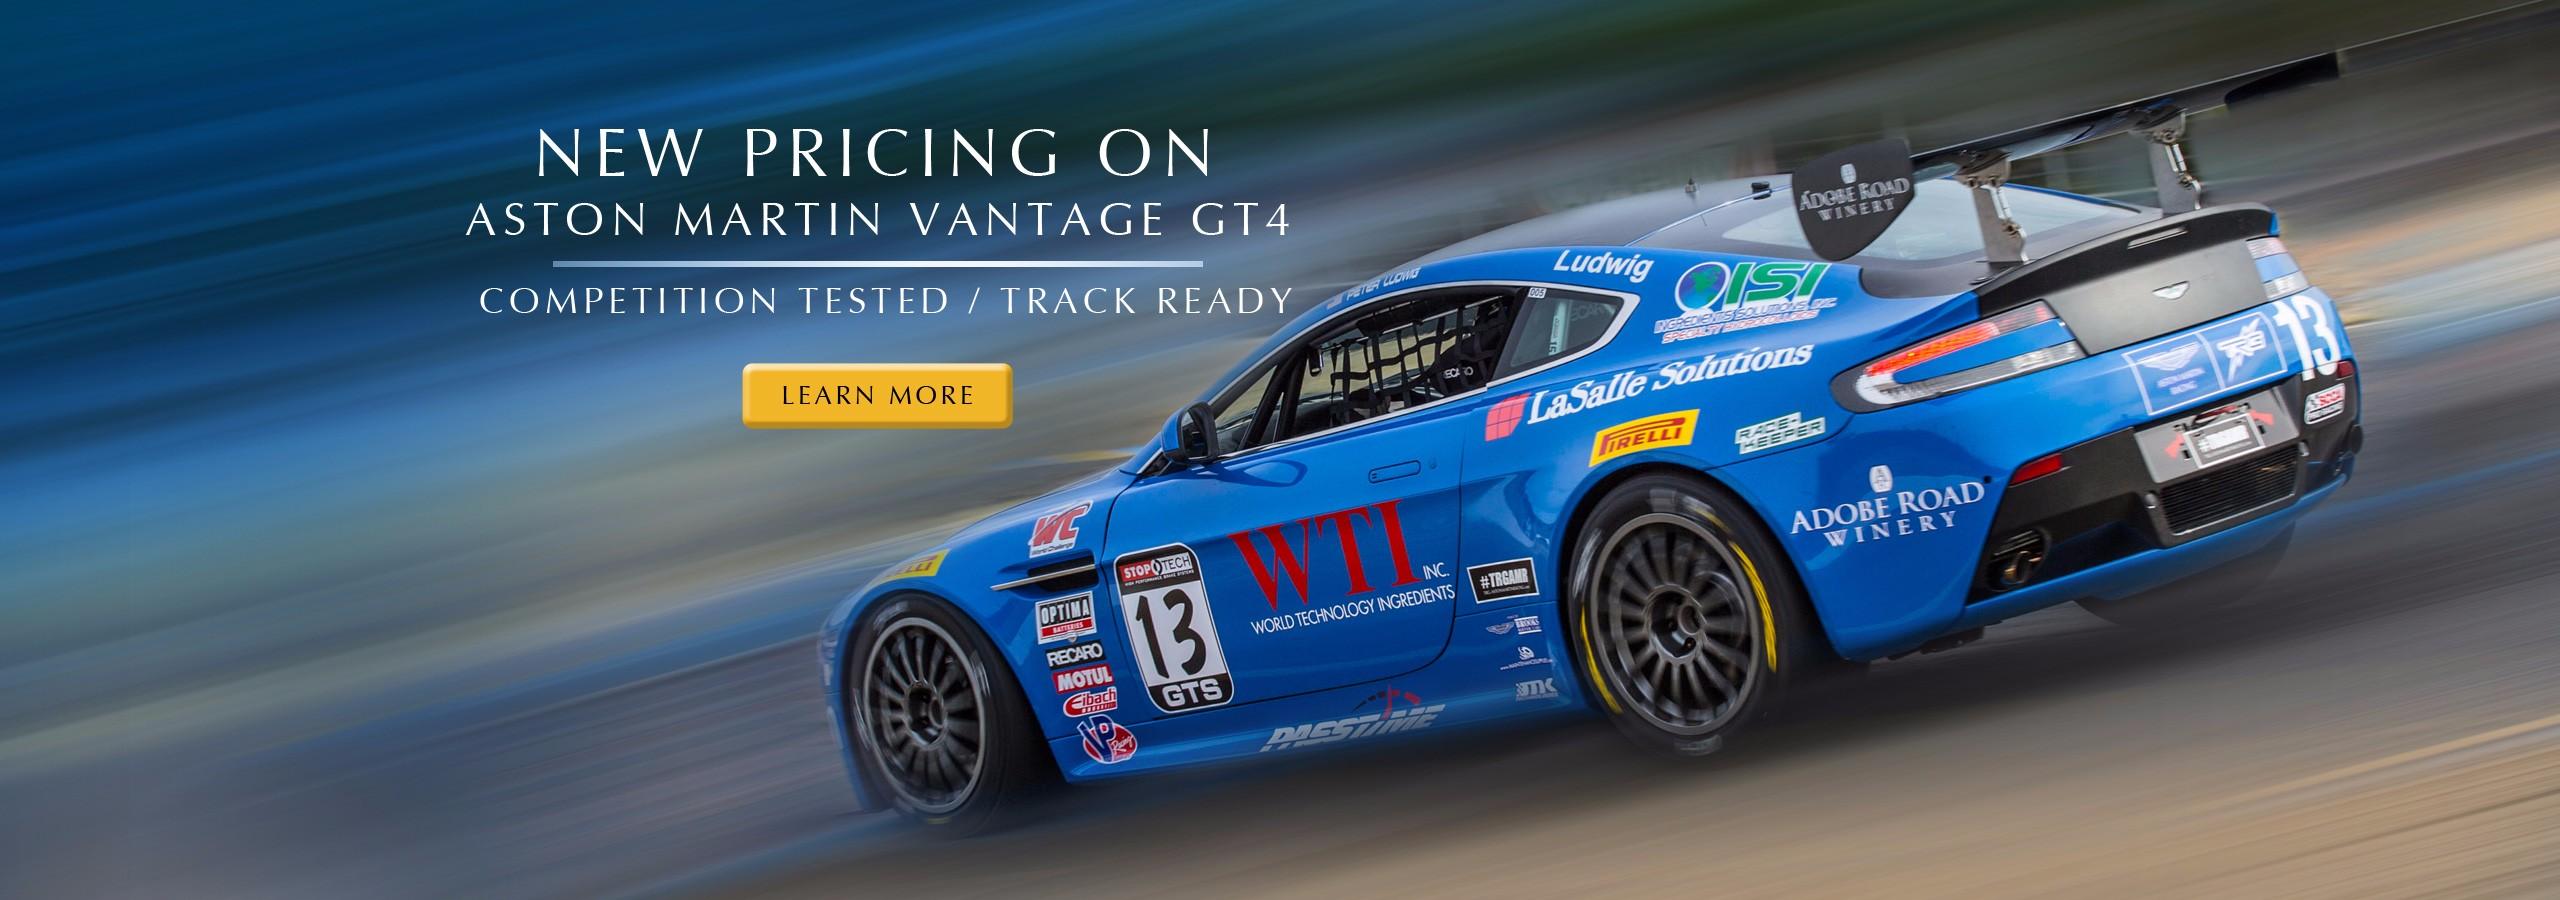 Aston Martin Vantage GT4 racecar - Price Drop